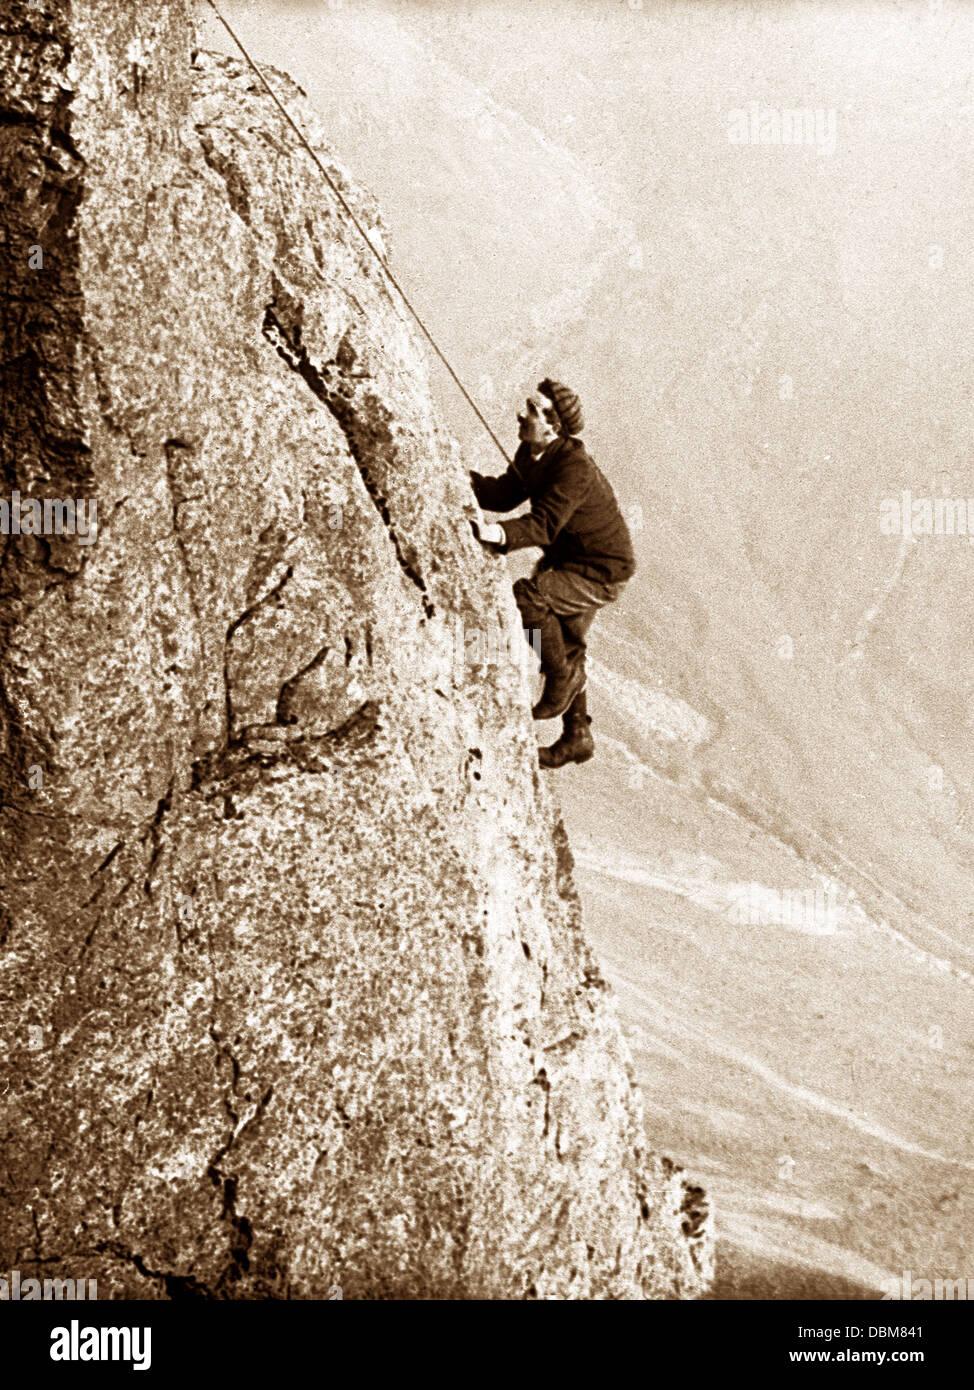 Climbing Great Gable Eagle's Nest Arete Victorian period - Stock Image